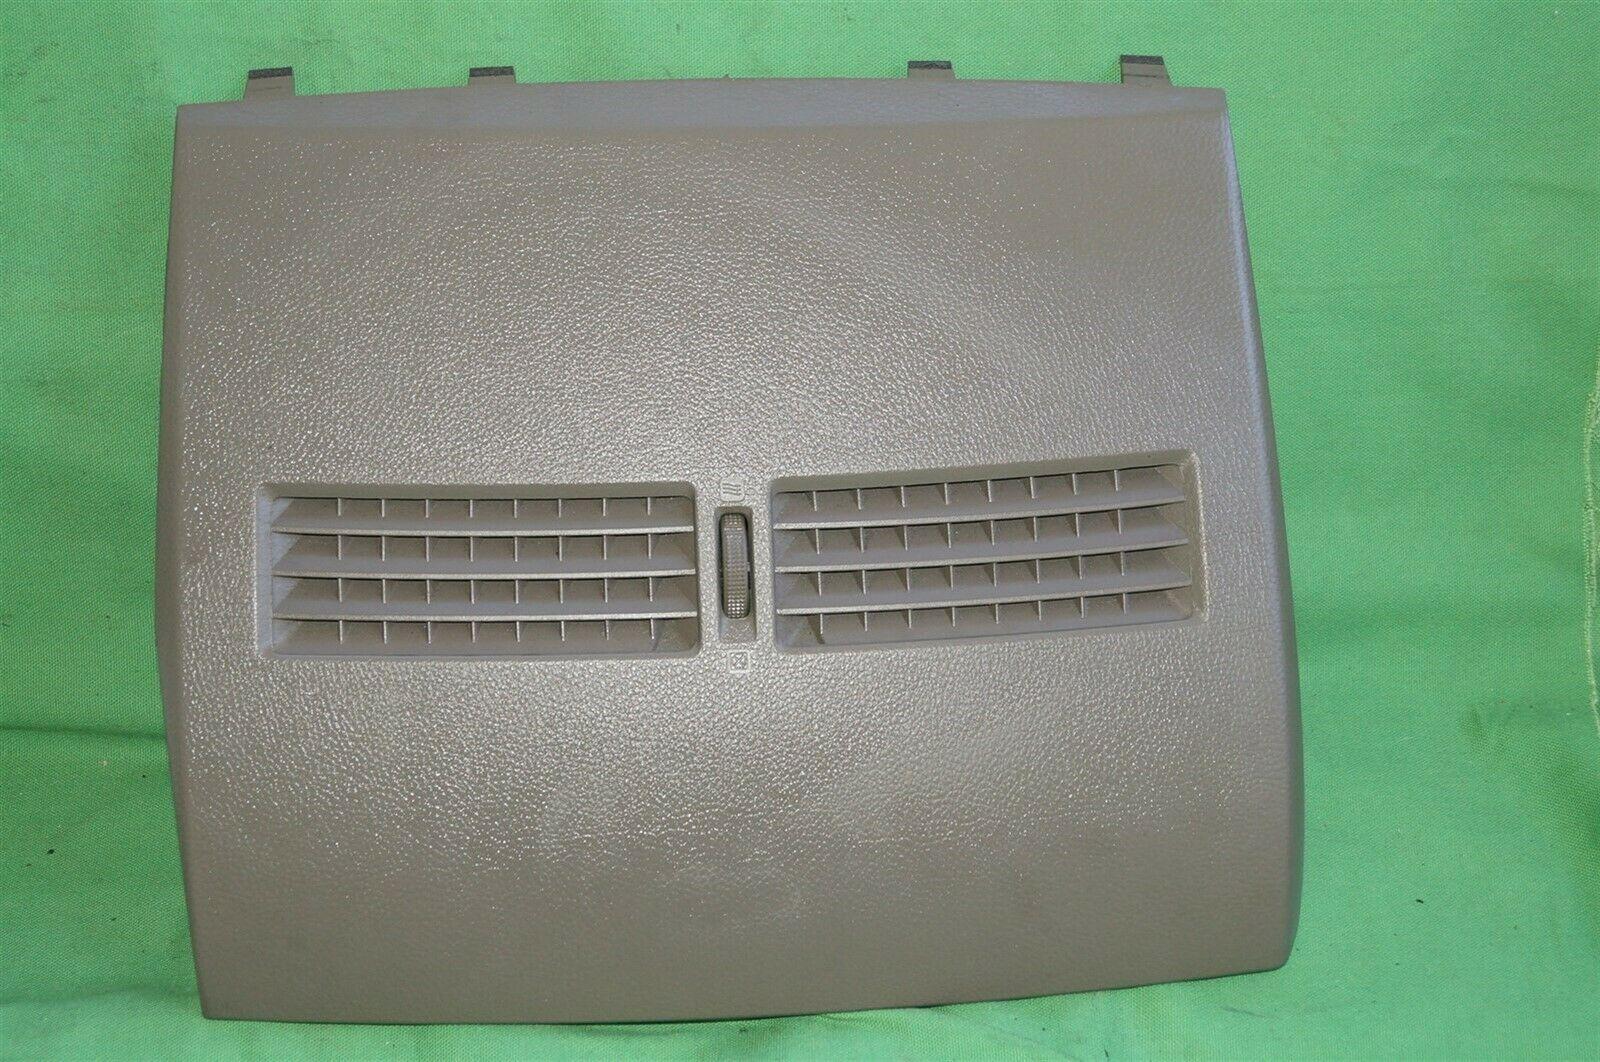 07-12 Nissan Versa Center Upper Dash Vent Bezel Trim Panel Tan/Brown